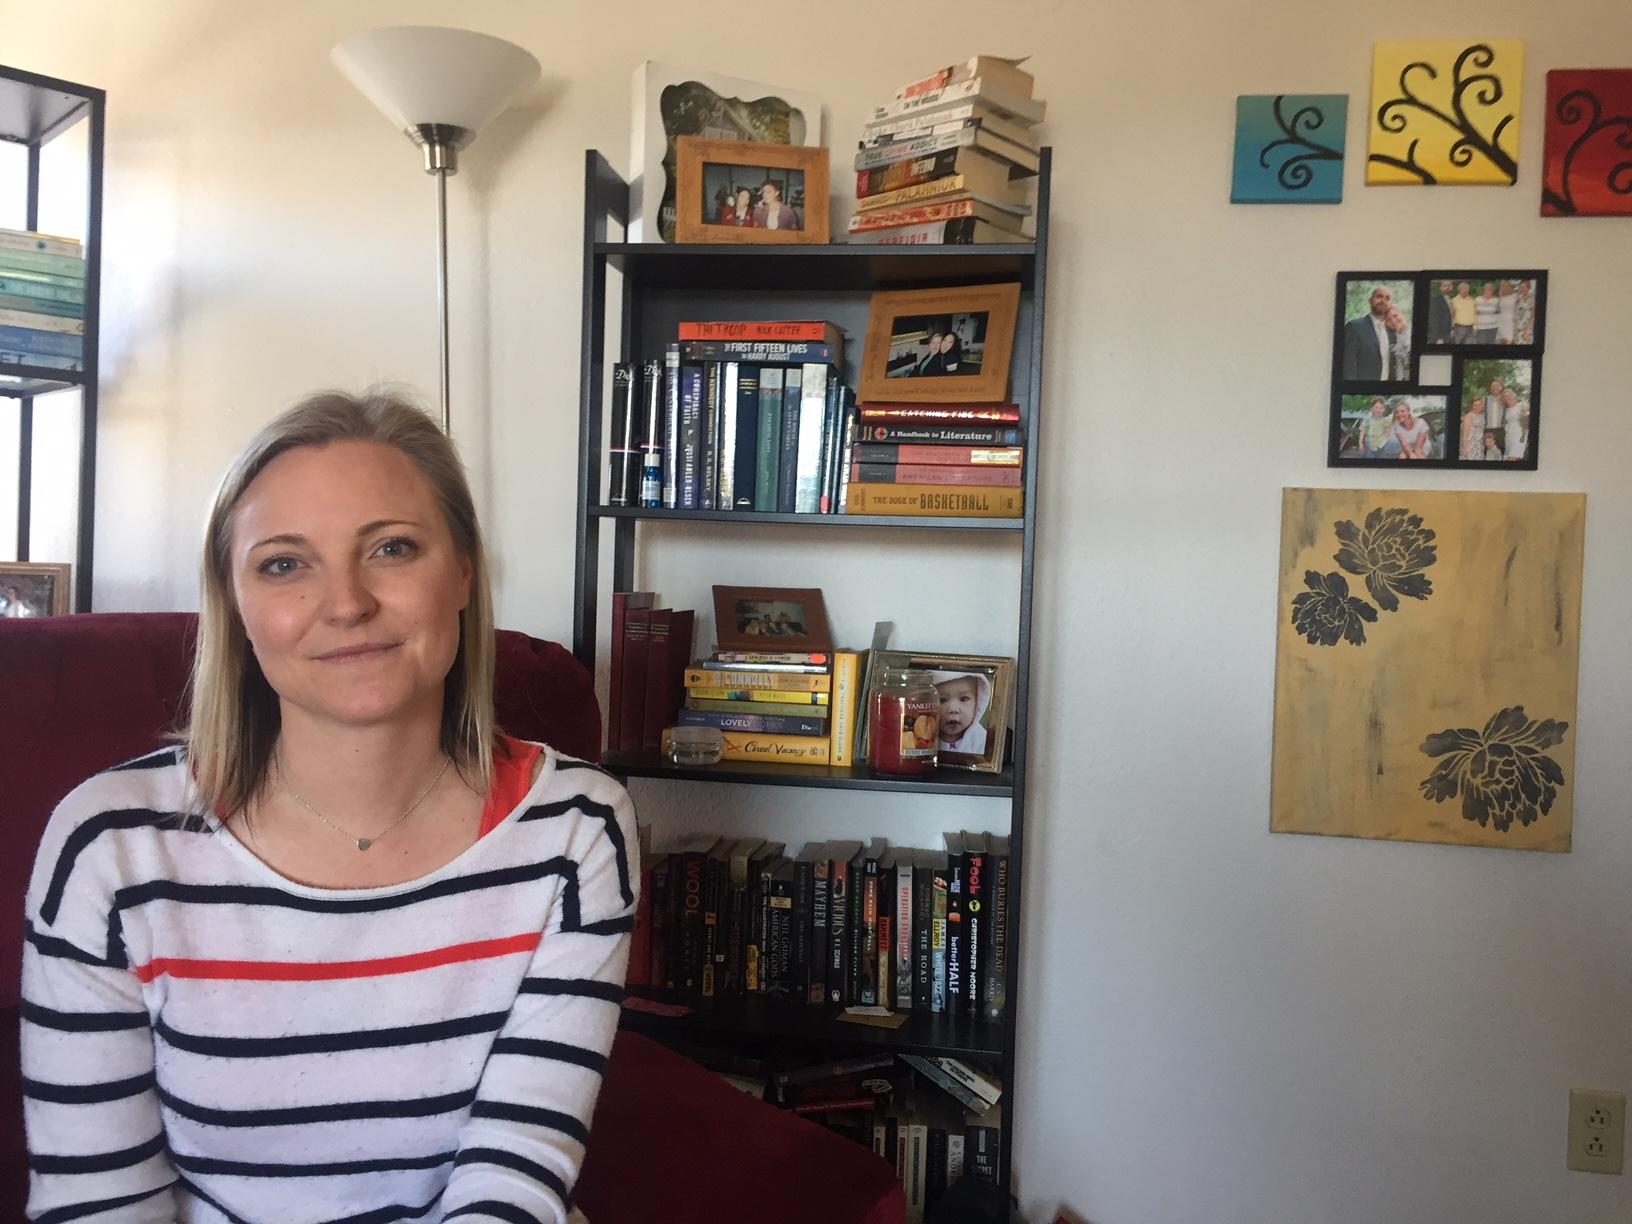 Heather Martin, teacher and Columbine survivor